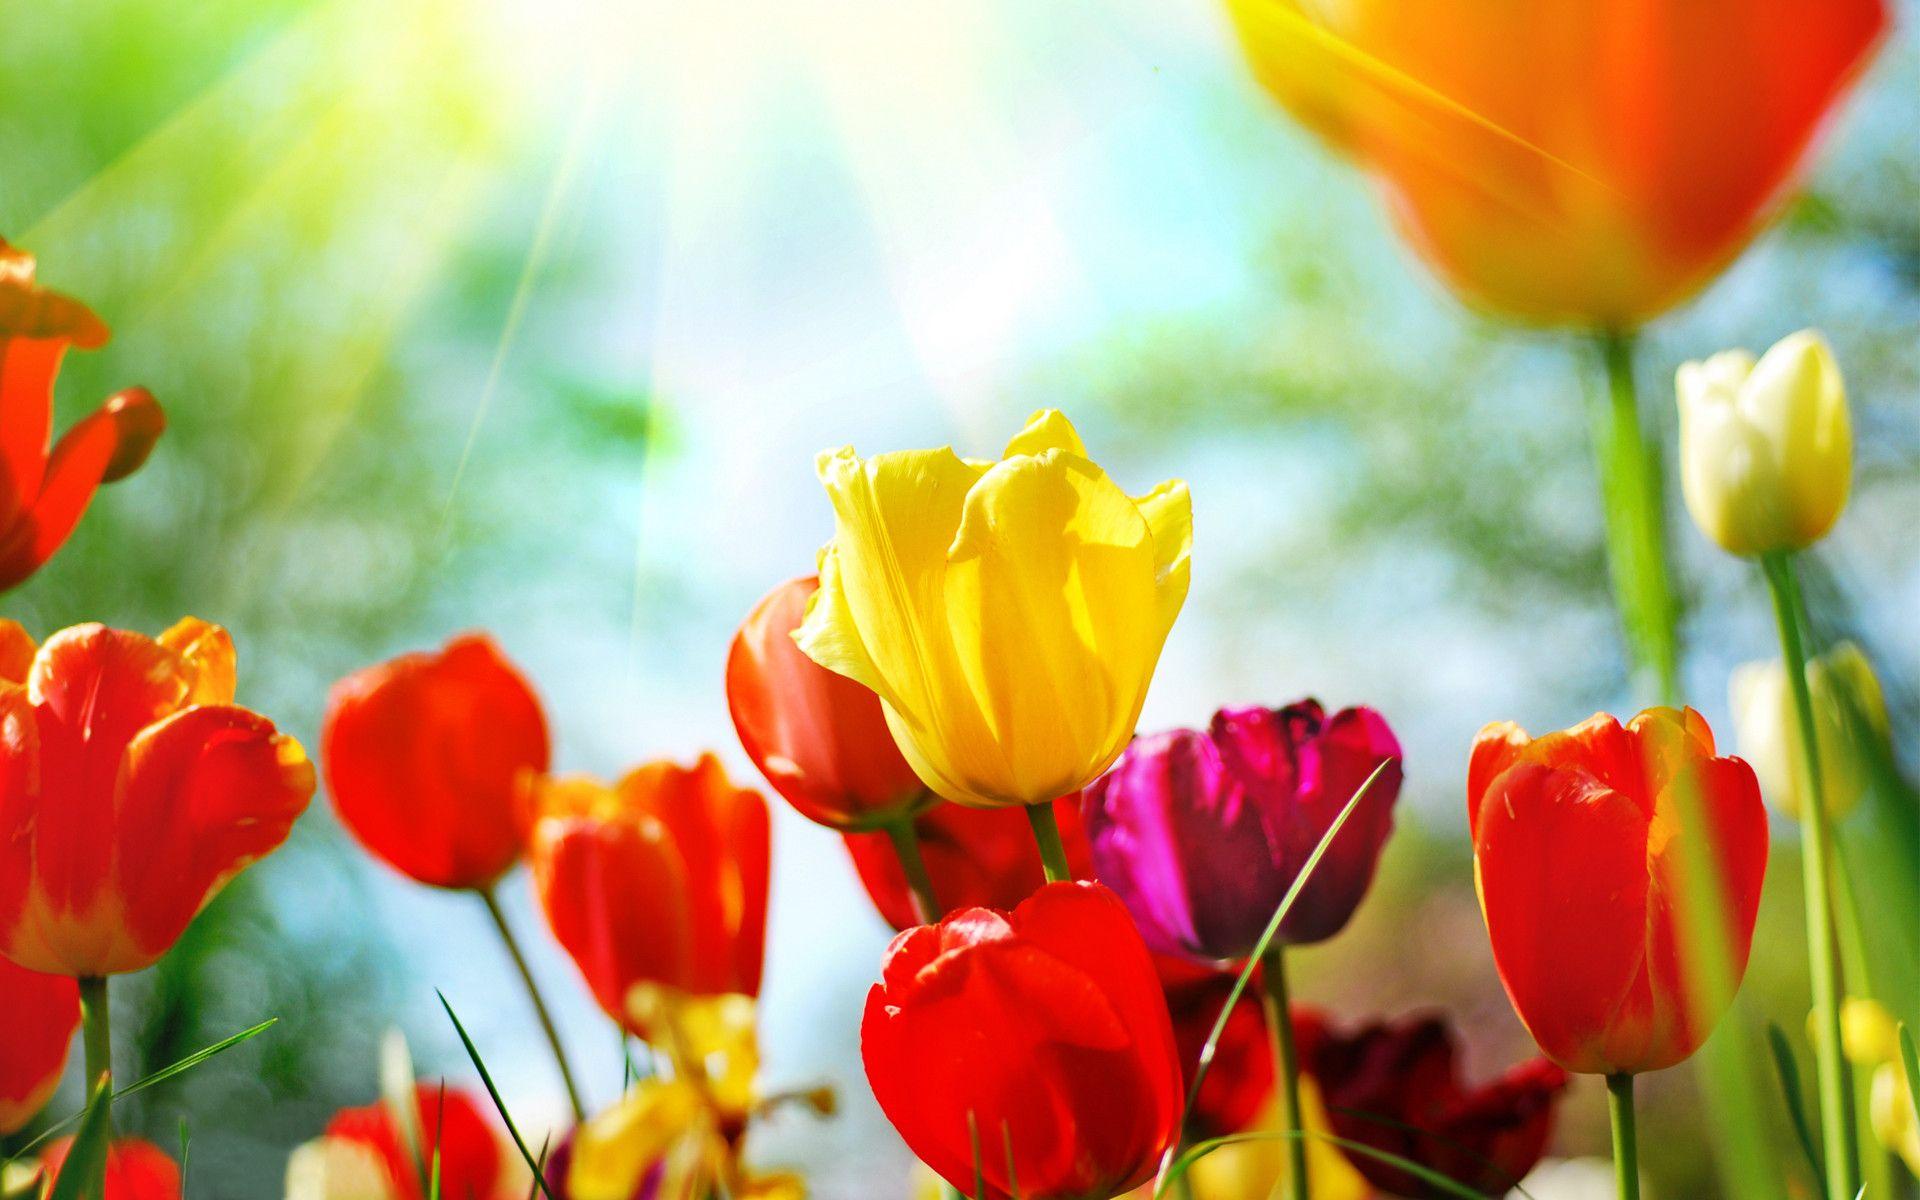 1920x1200 spring flowers desktop background free download wallpaper 1920x1200 spring flowers desktop background free download wallpaper hd mightylinksfo